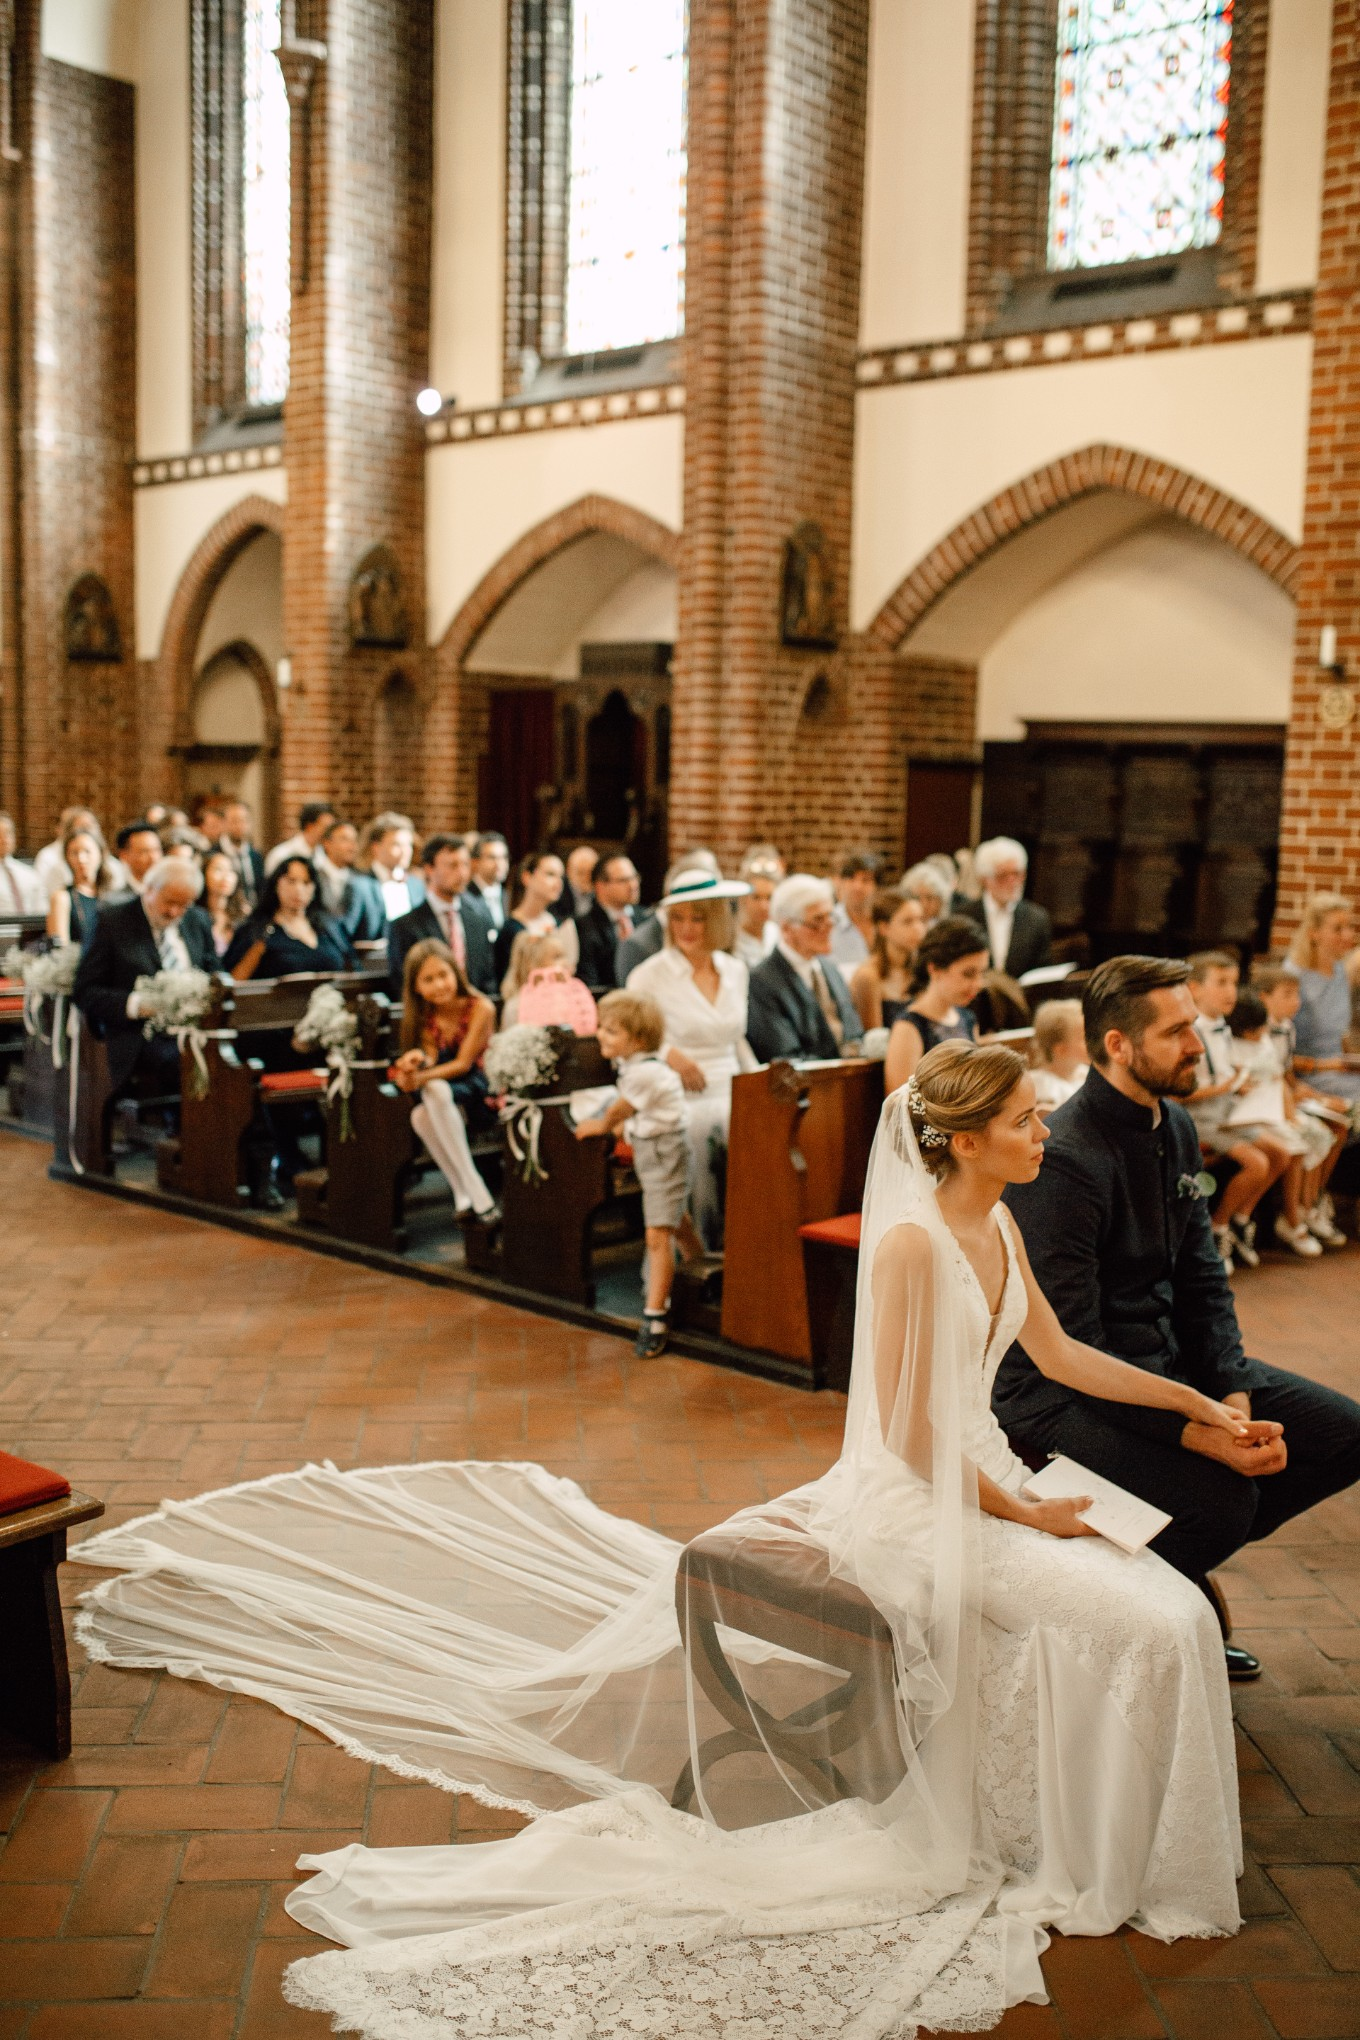 Berlin-Wannsee-Pia-Anna-Christian-Wedding-Photography-ST-15.jpg